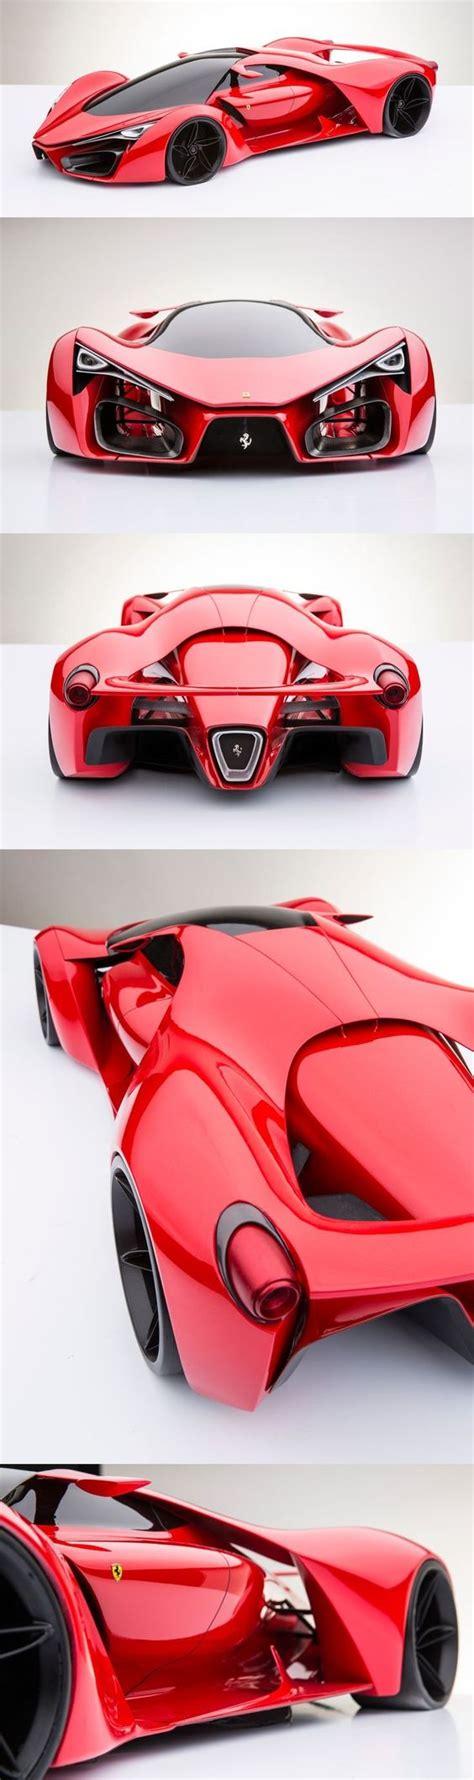 ferrari f80 concept car ferrari f80 ferrari and jet skies on pinterest